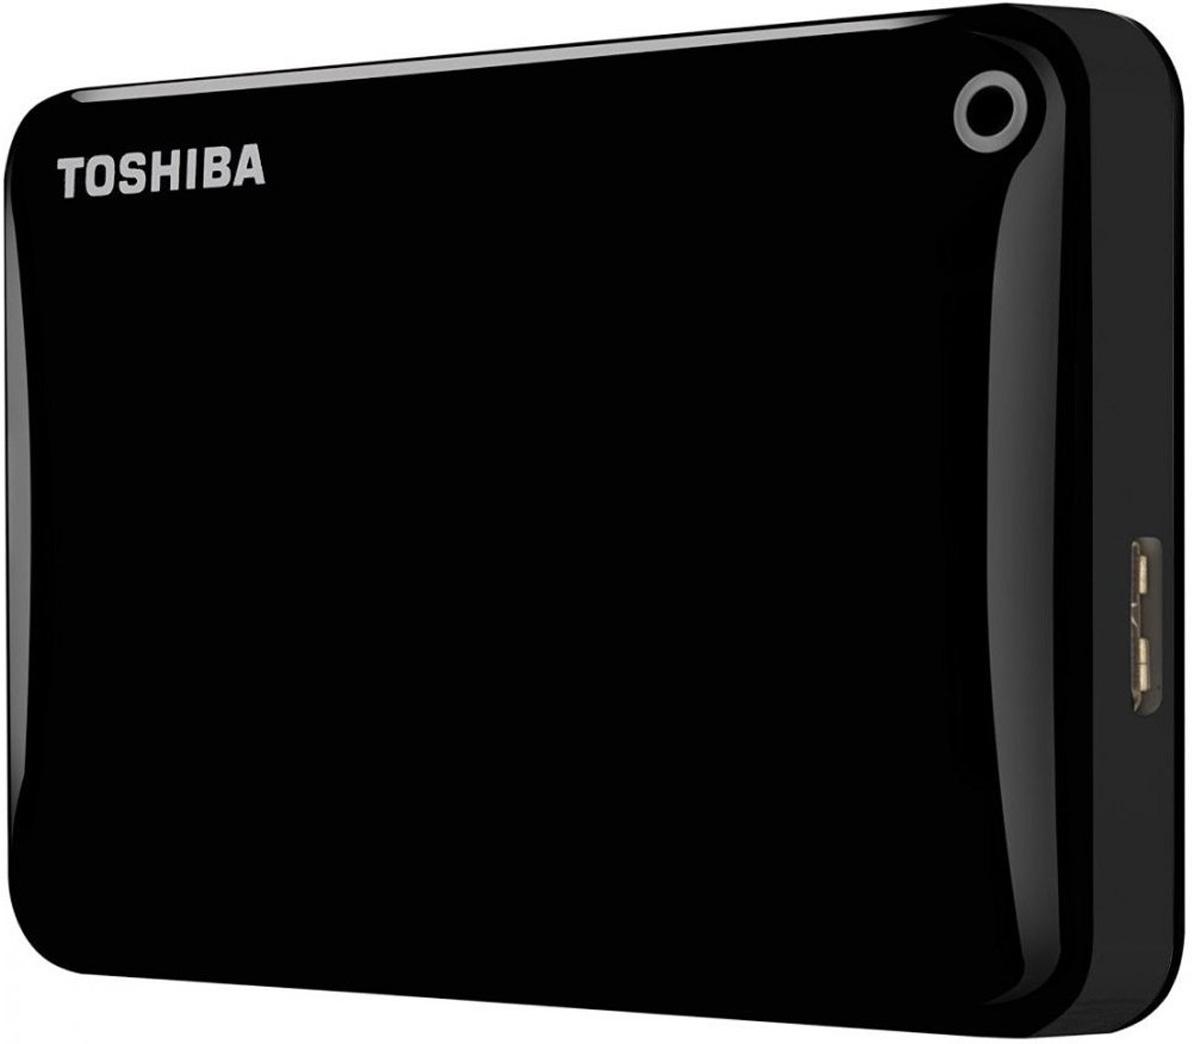 Toshiba Canvio Connect II 3TB, Black внешний жесткий диск (HDTC830EK3CA)